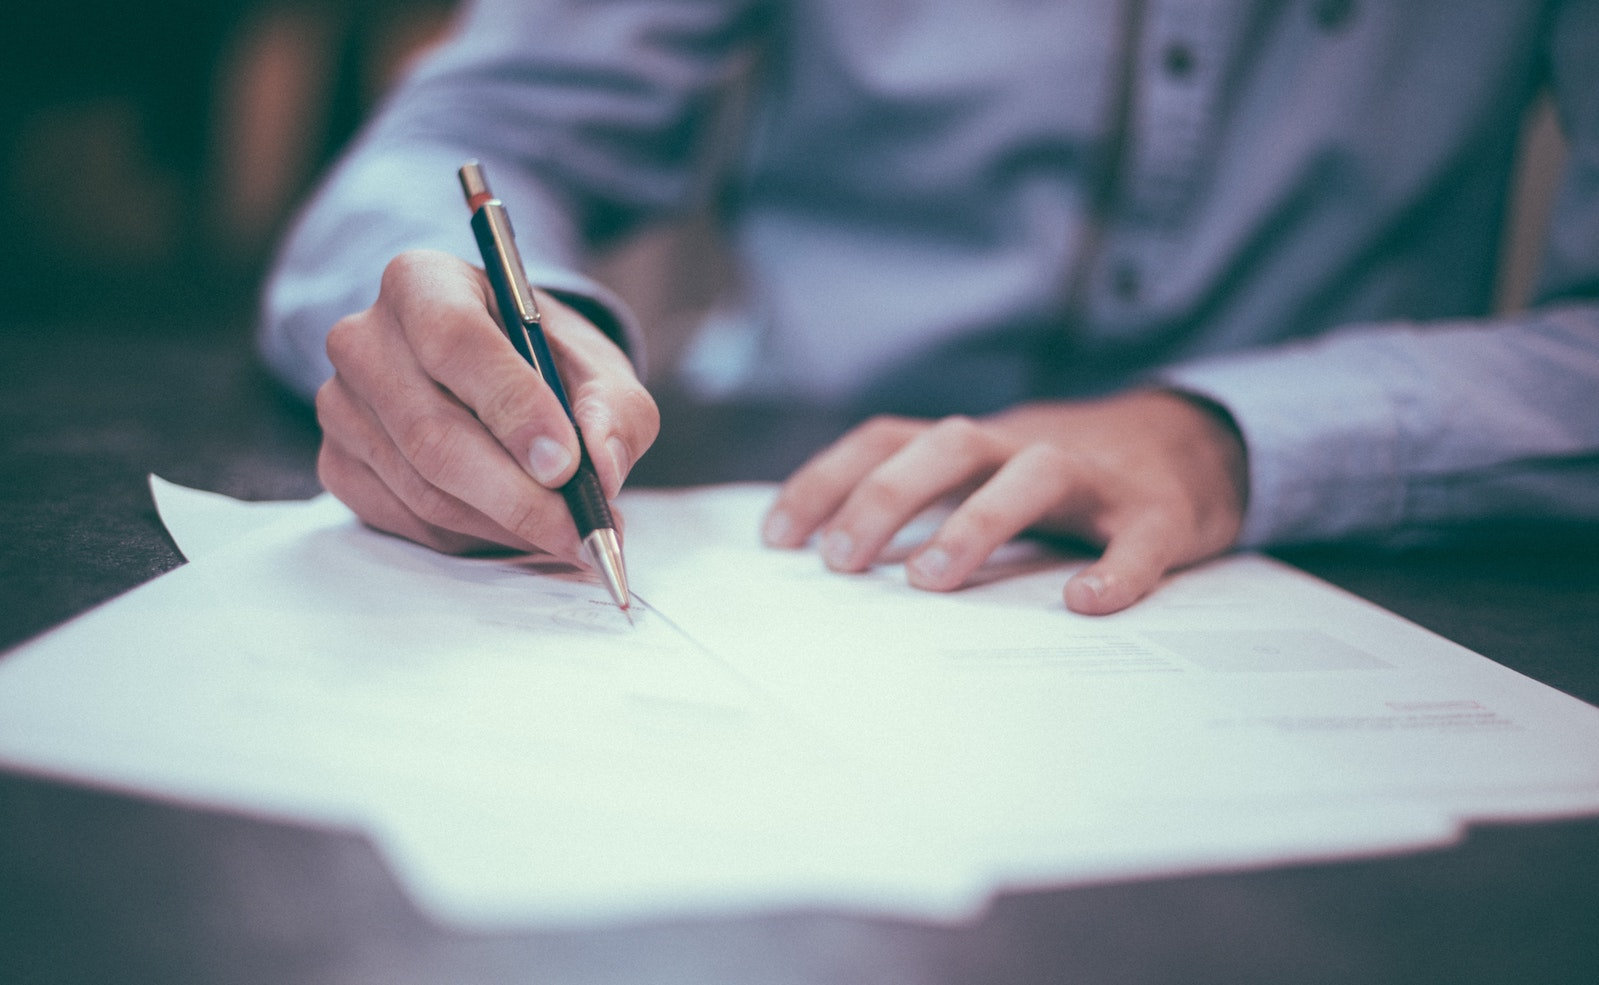 Kaufvertrag Küche: Das musst du beim Vertragsabschluss beachten